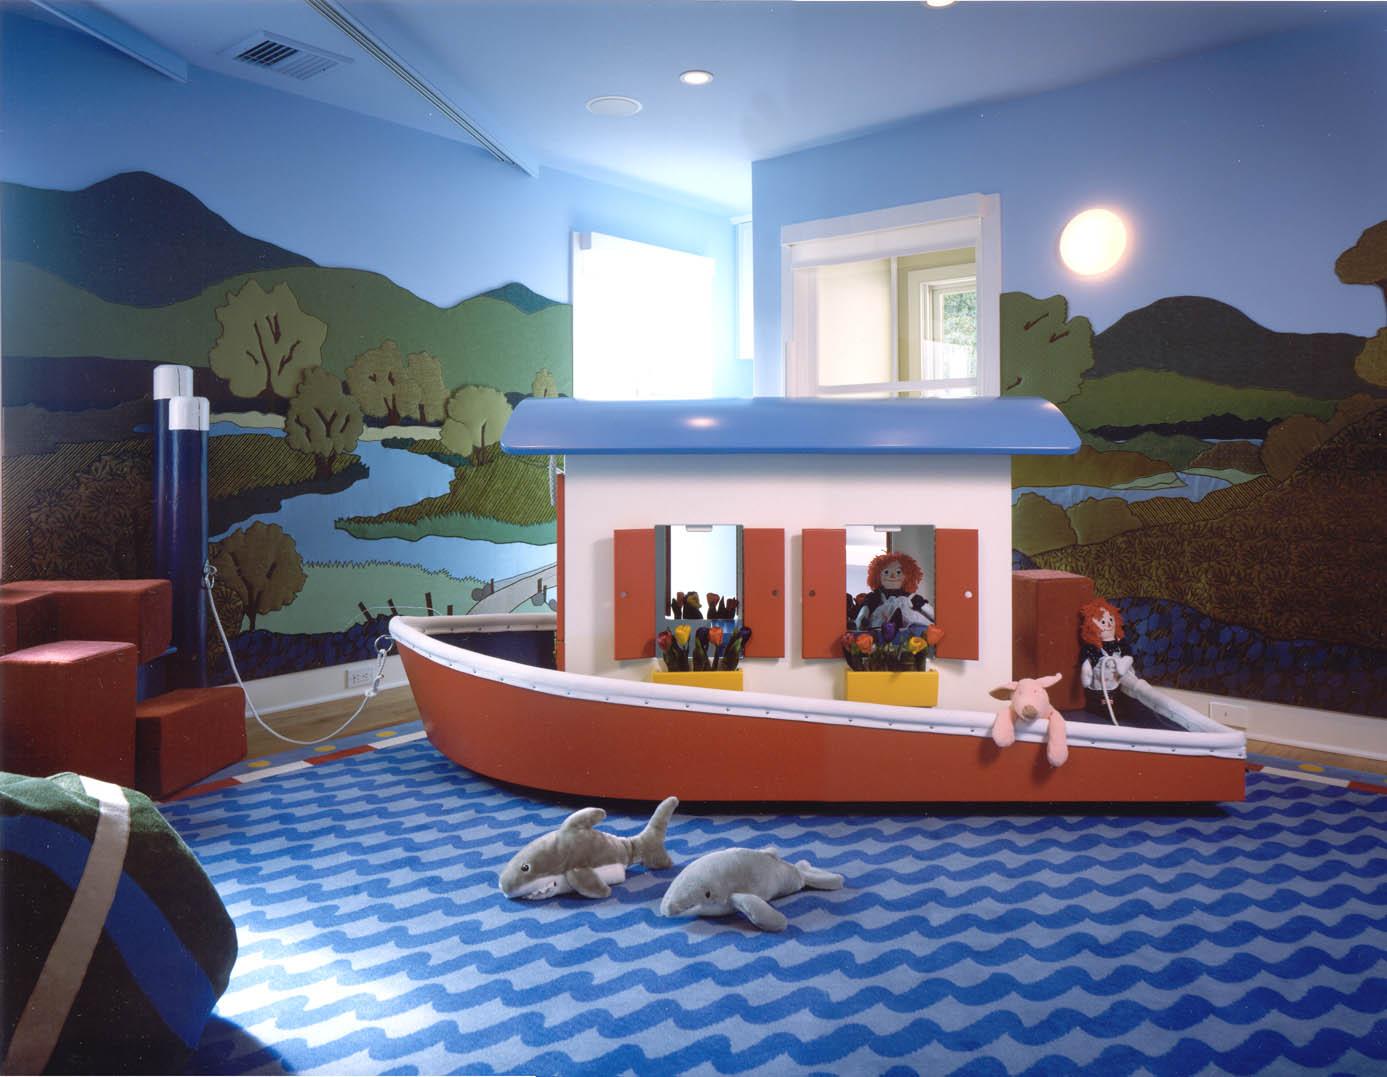 Kids Room Wall Design: Kids Playroom Designs & Ideas